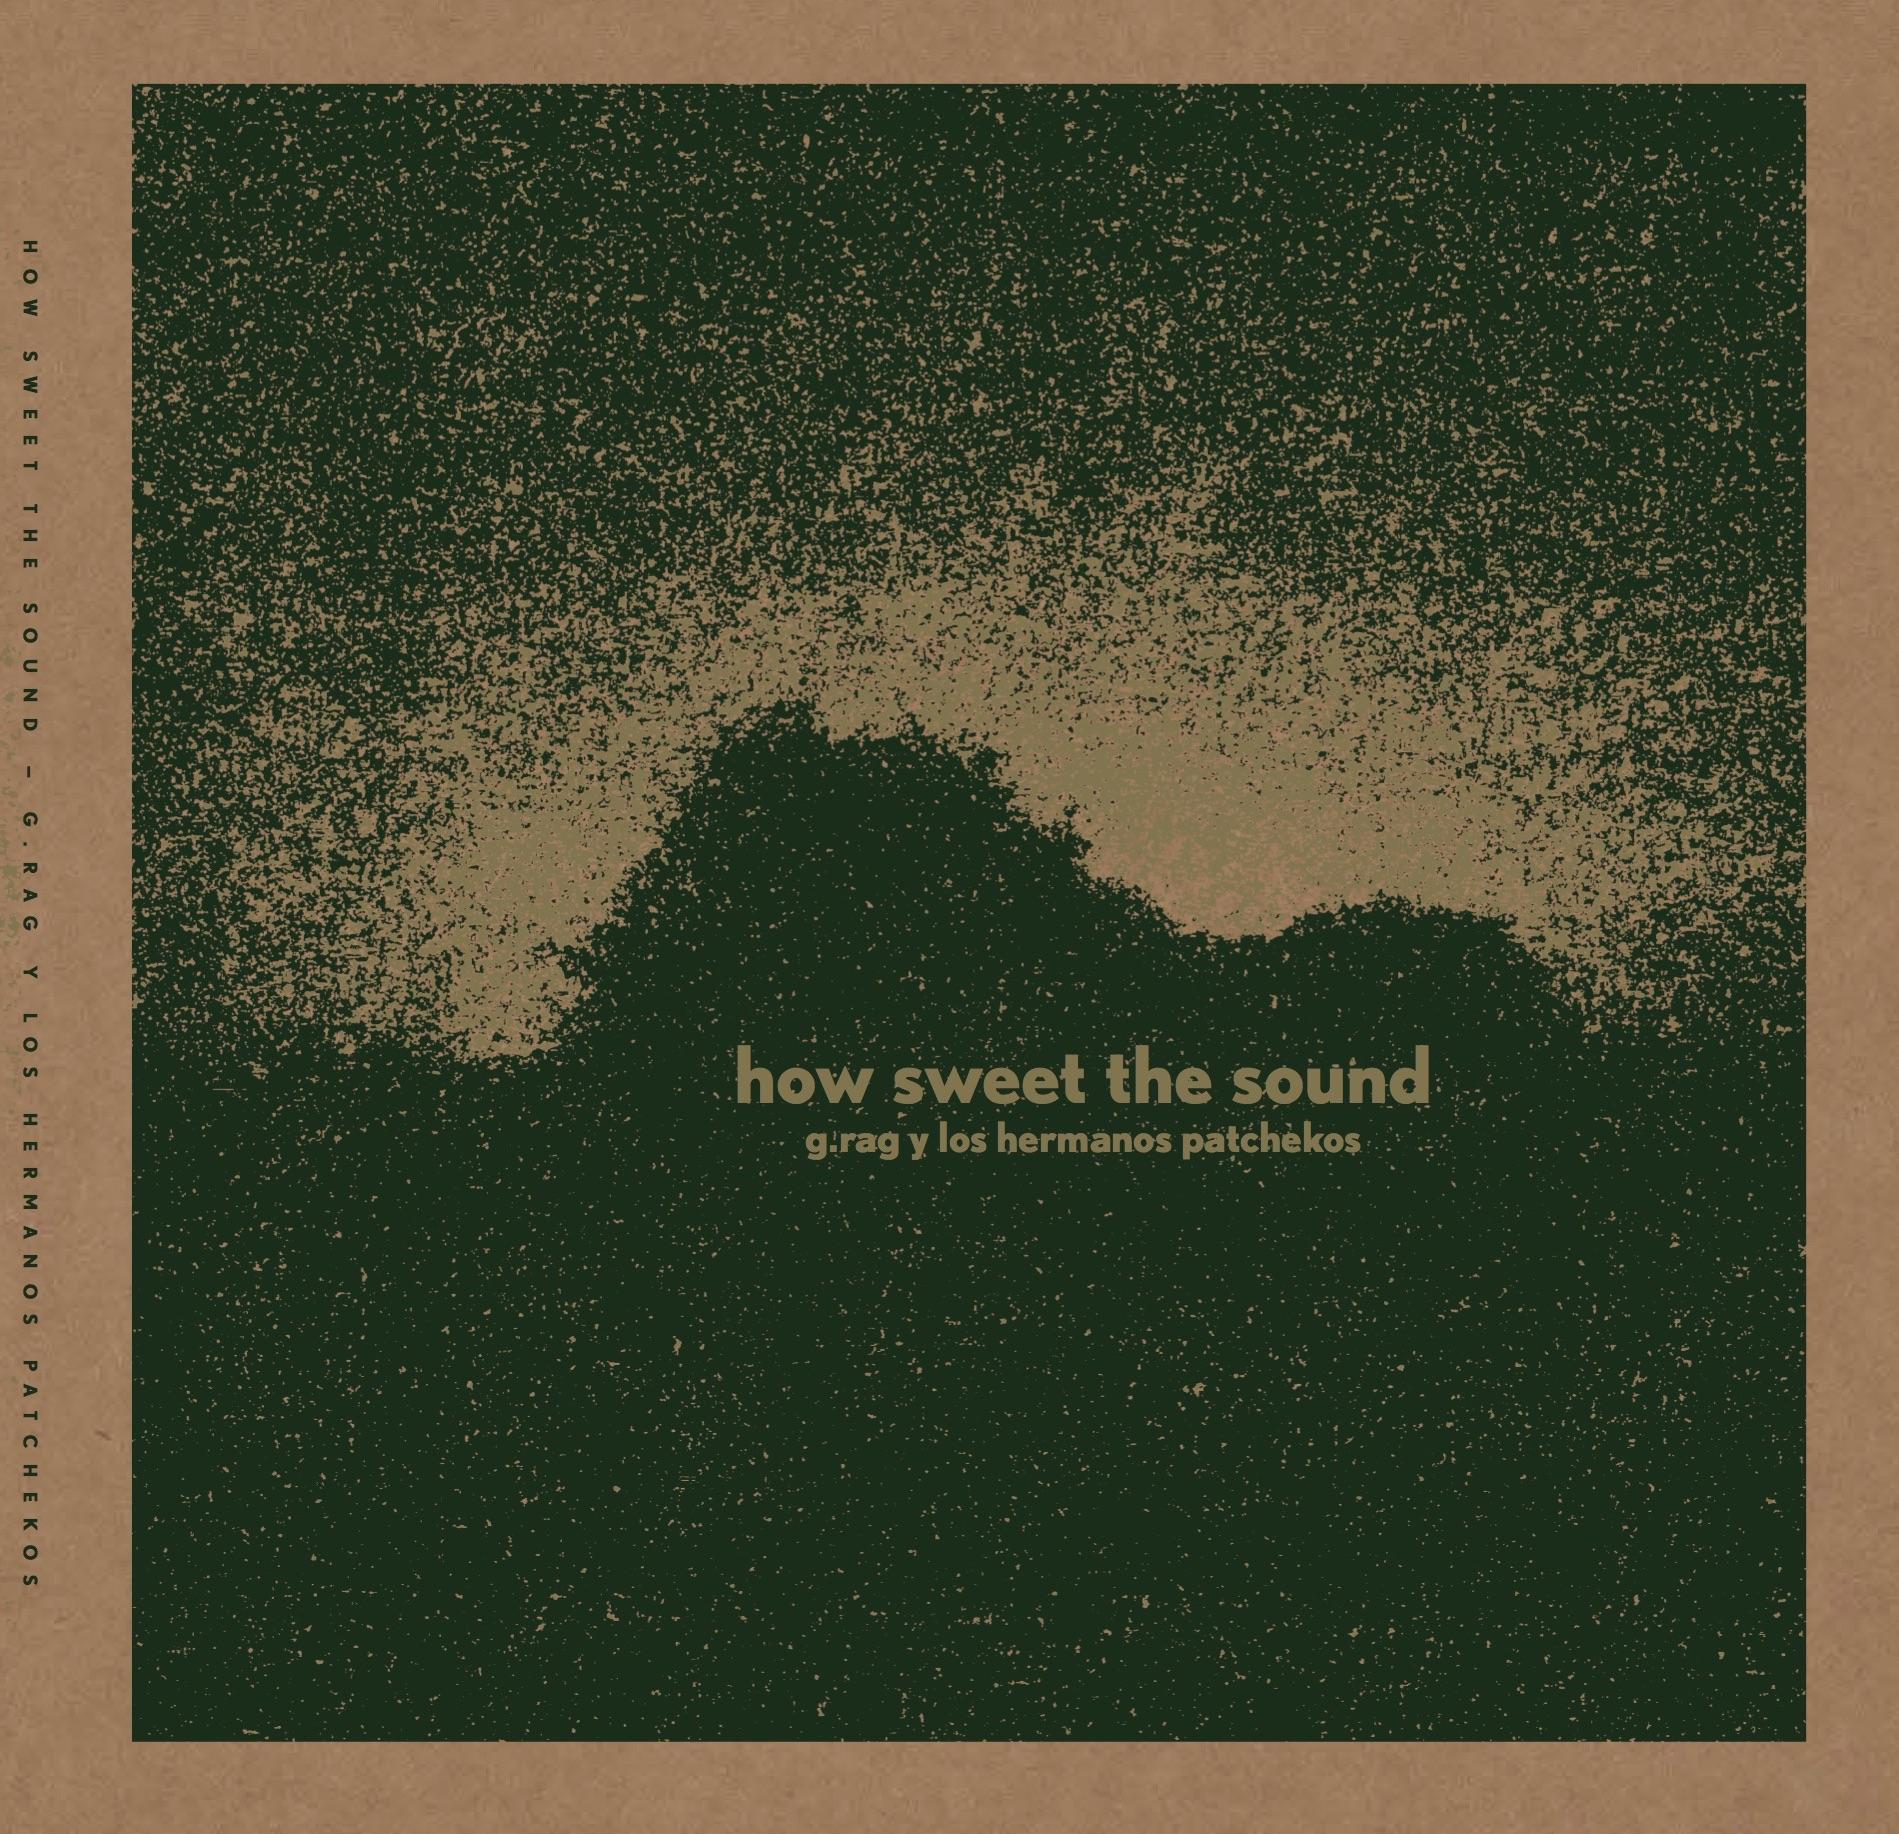 G.Rag Y Los Hermanos Patchekos - How Sweet The Sound